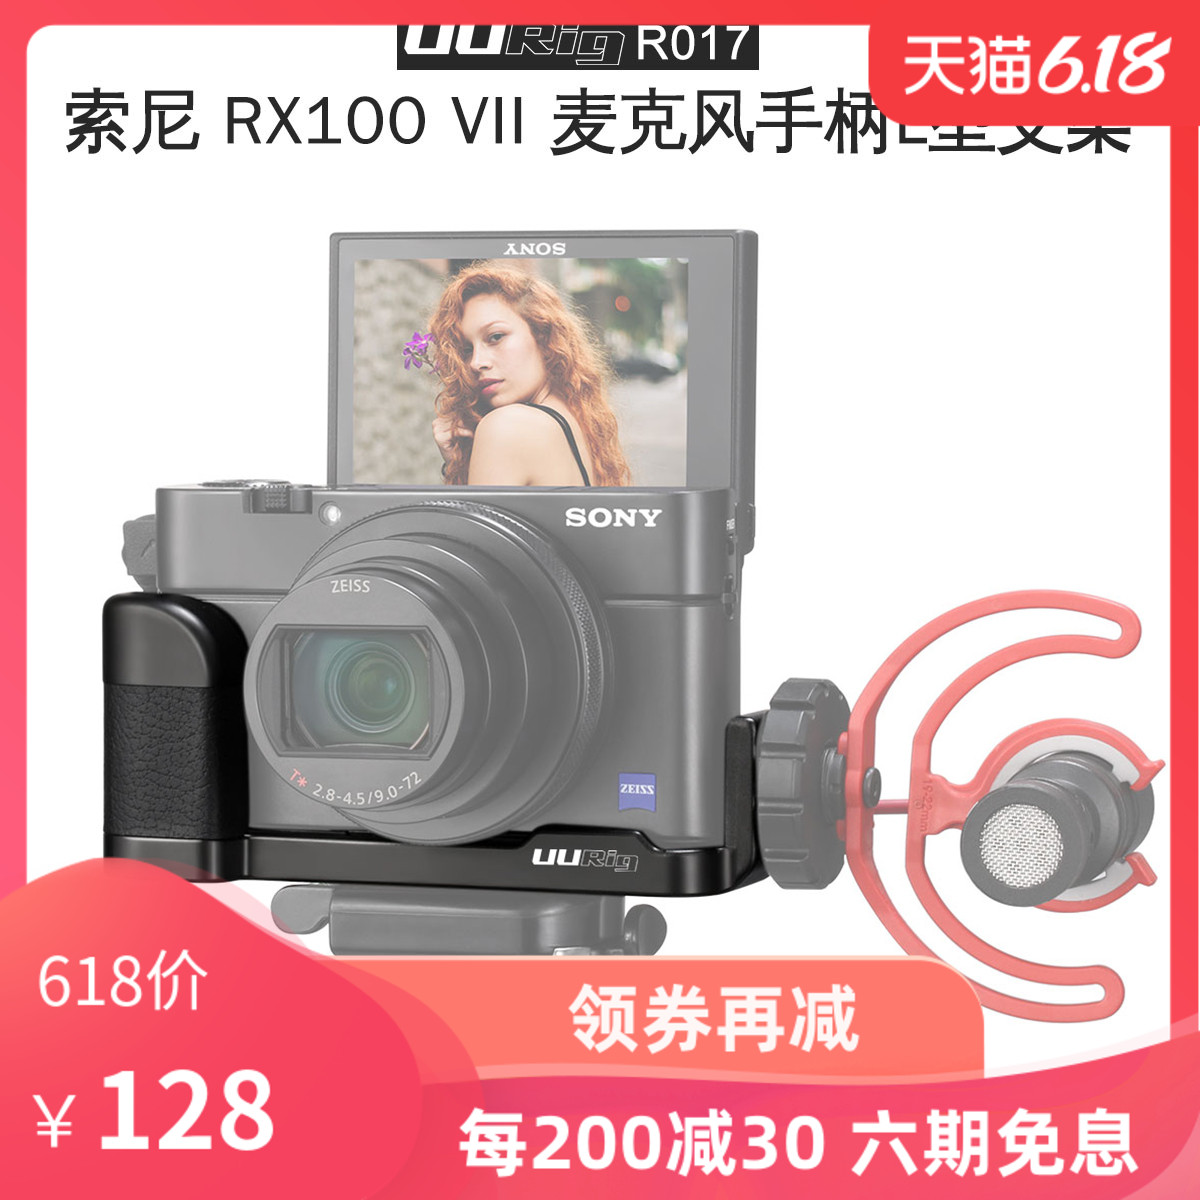 Фотокамеры Артикул 605565740361